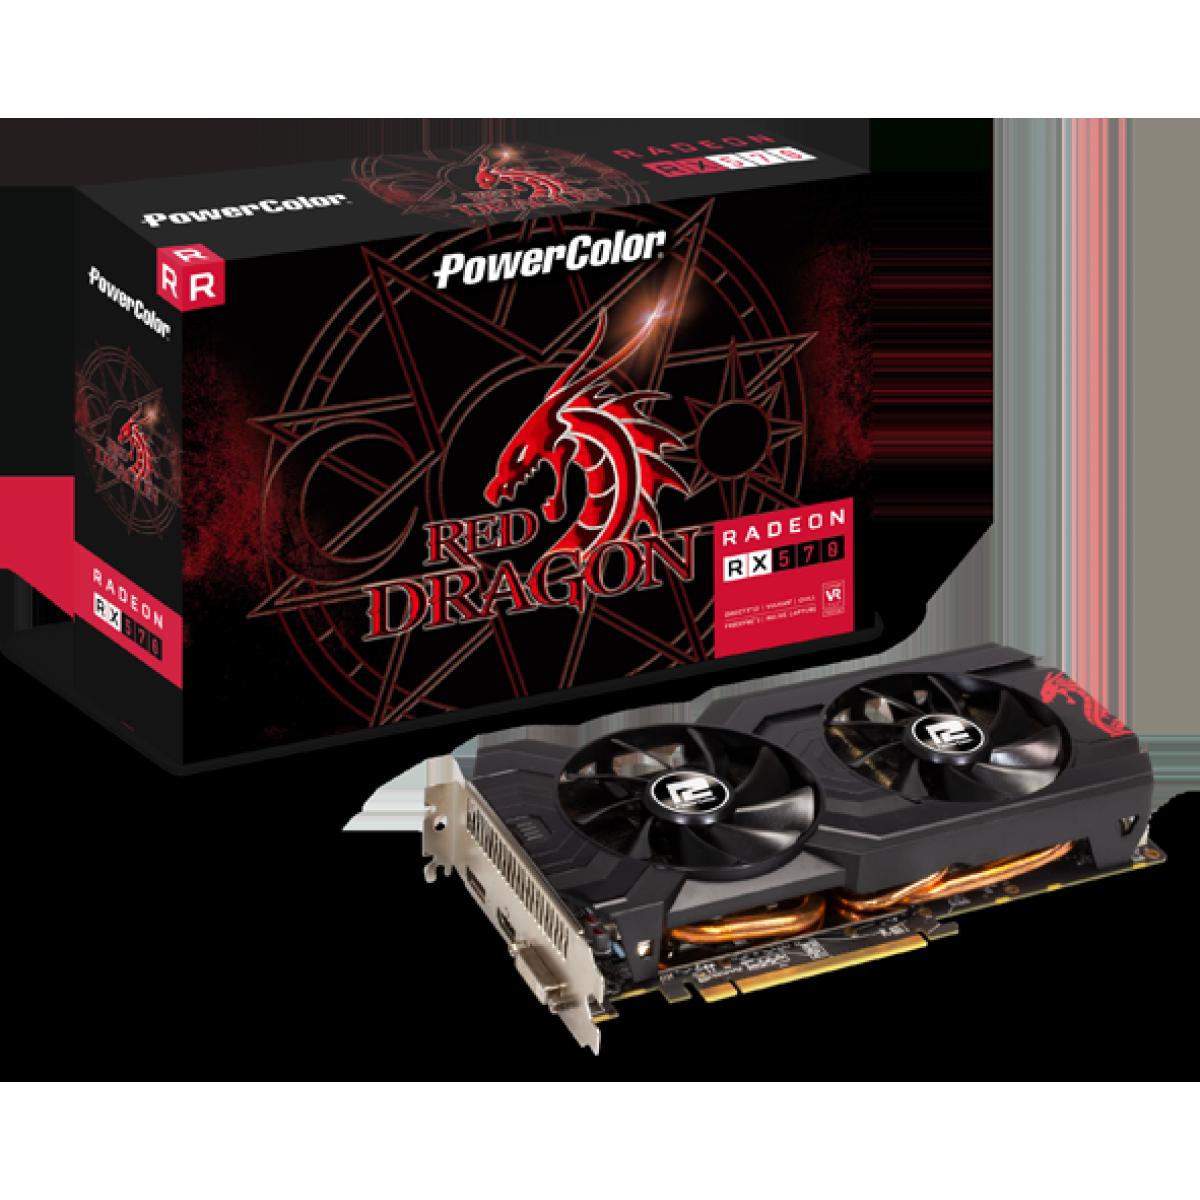 Placa de Vídeo PowerColor, Radeon, RX 570 Red Dragon Dual, 4GB GDDR5, 256Bit, AXRX 570 4GBD5-DHDV3/OC